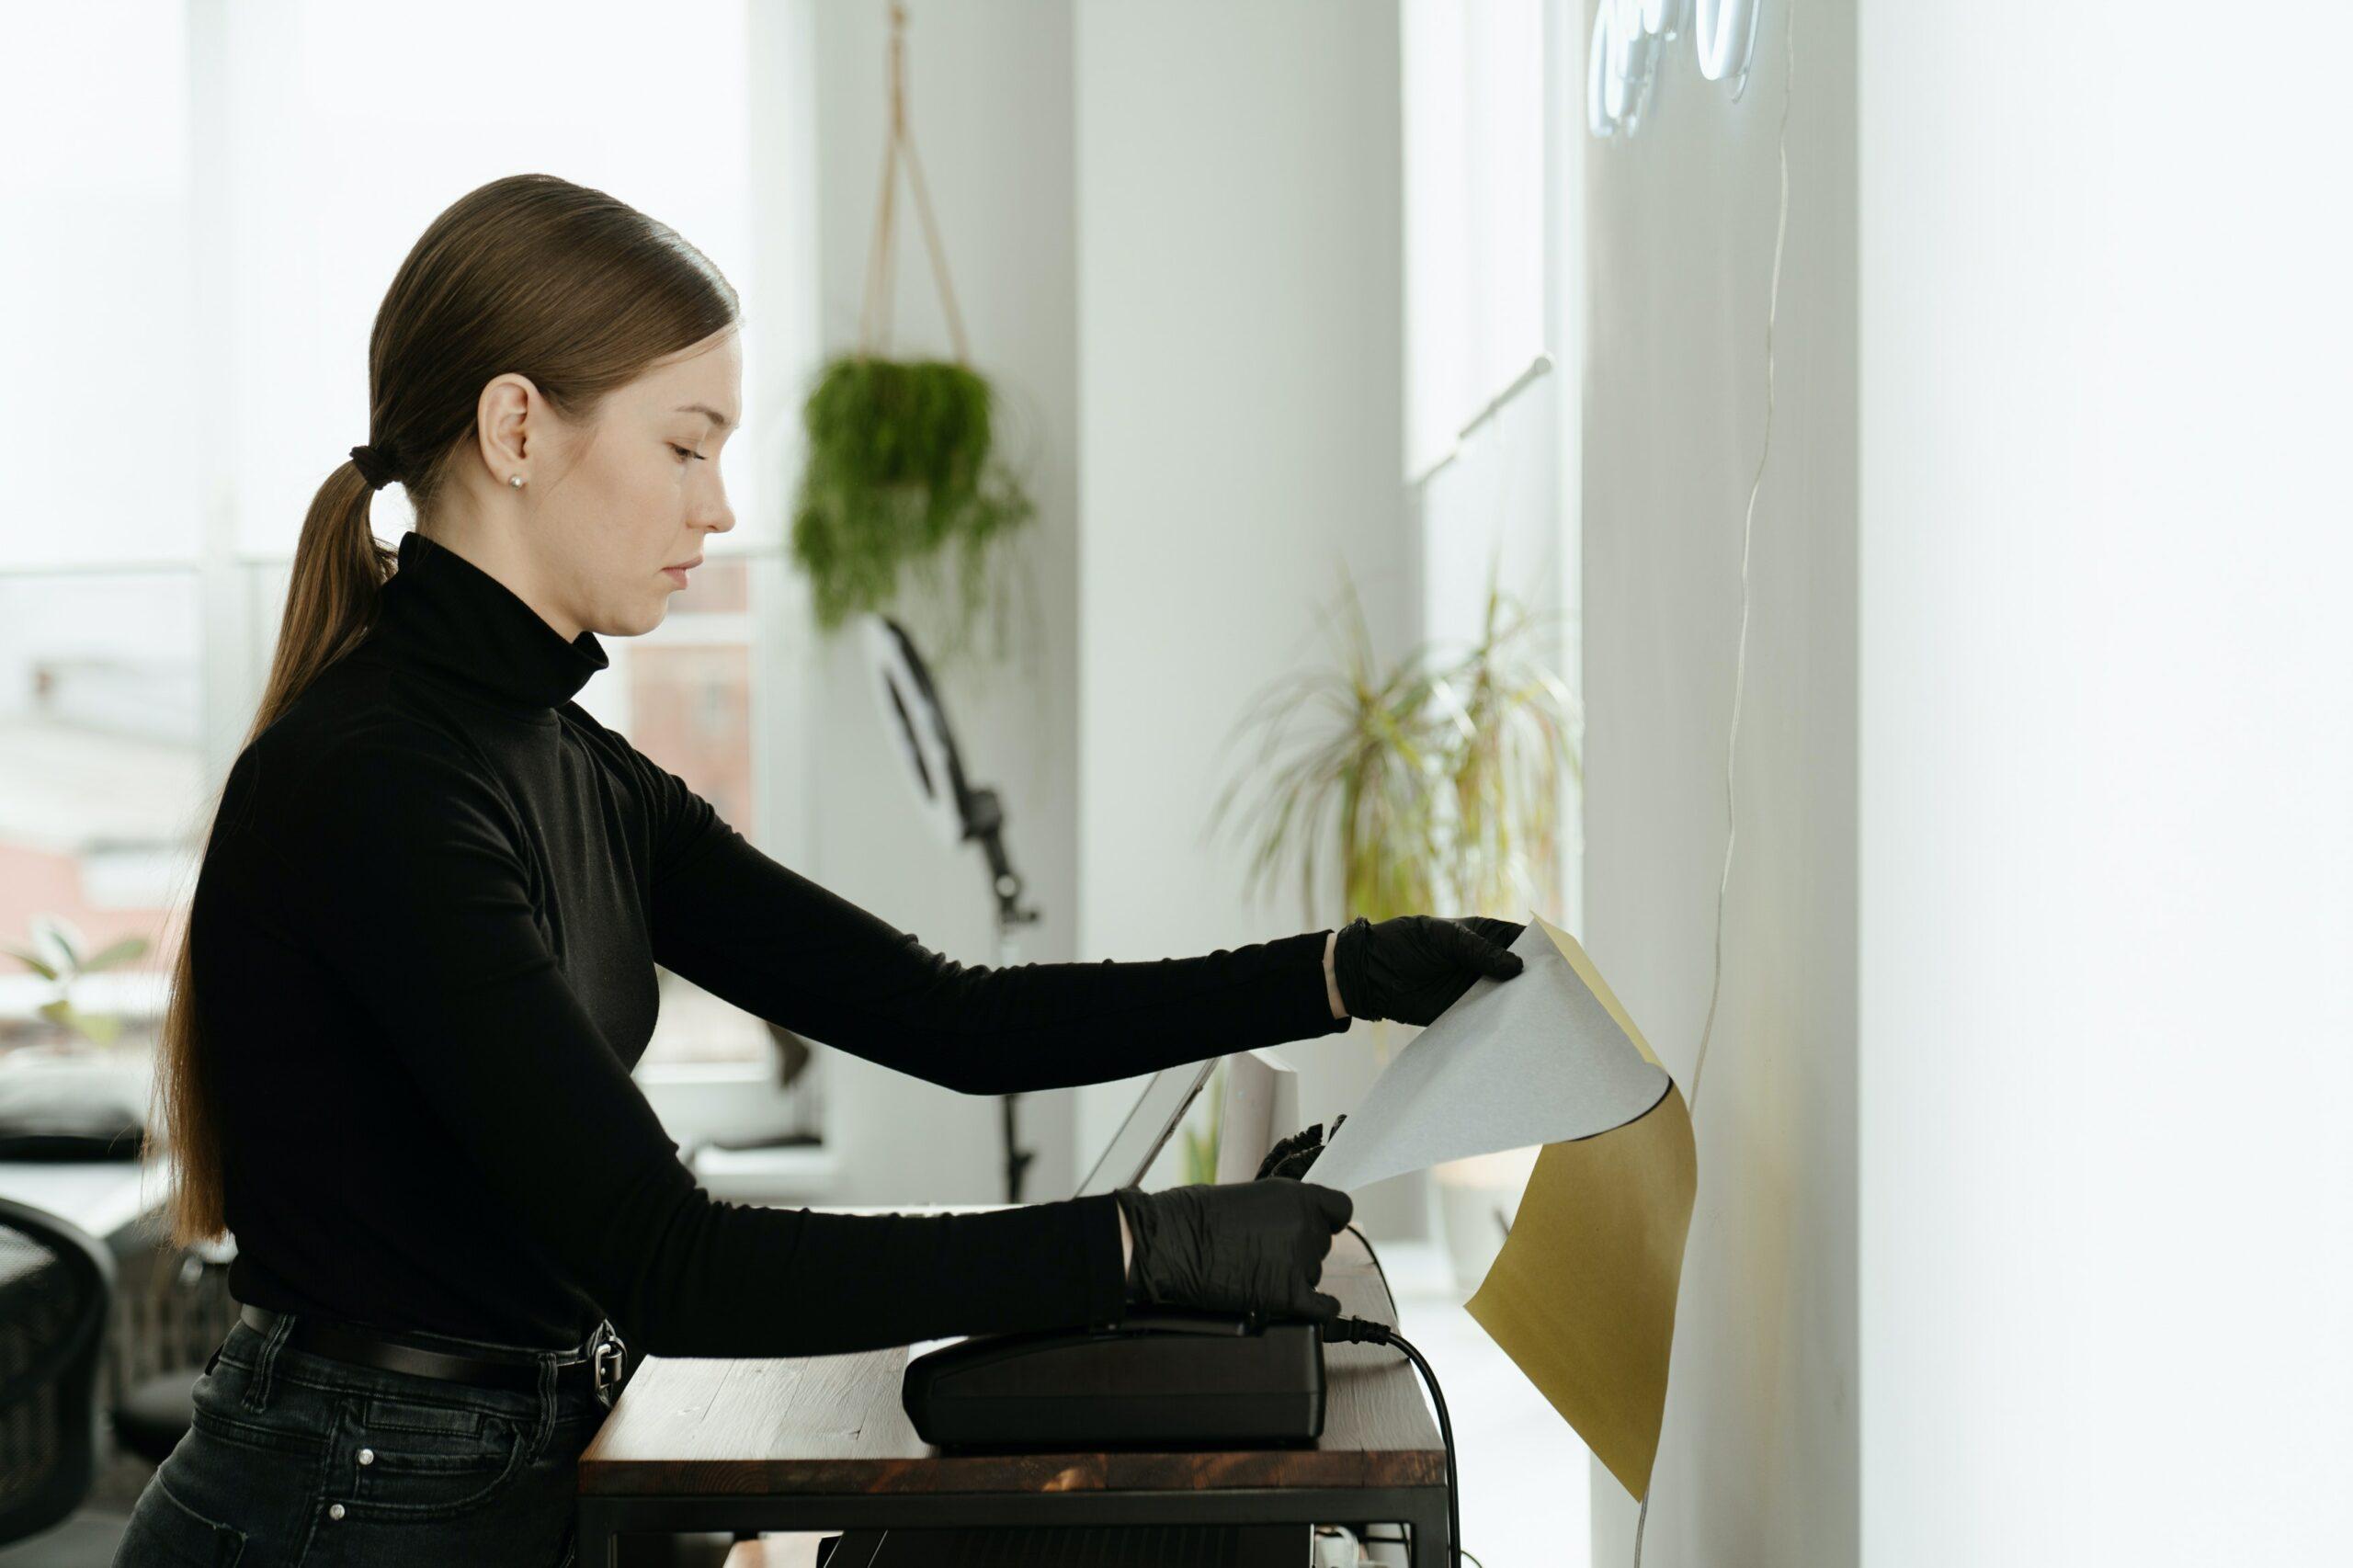 a teacher using a printer